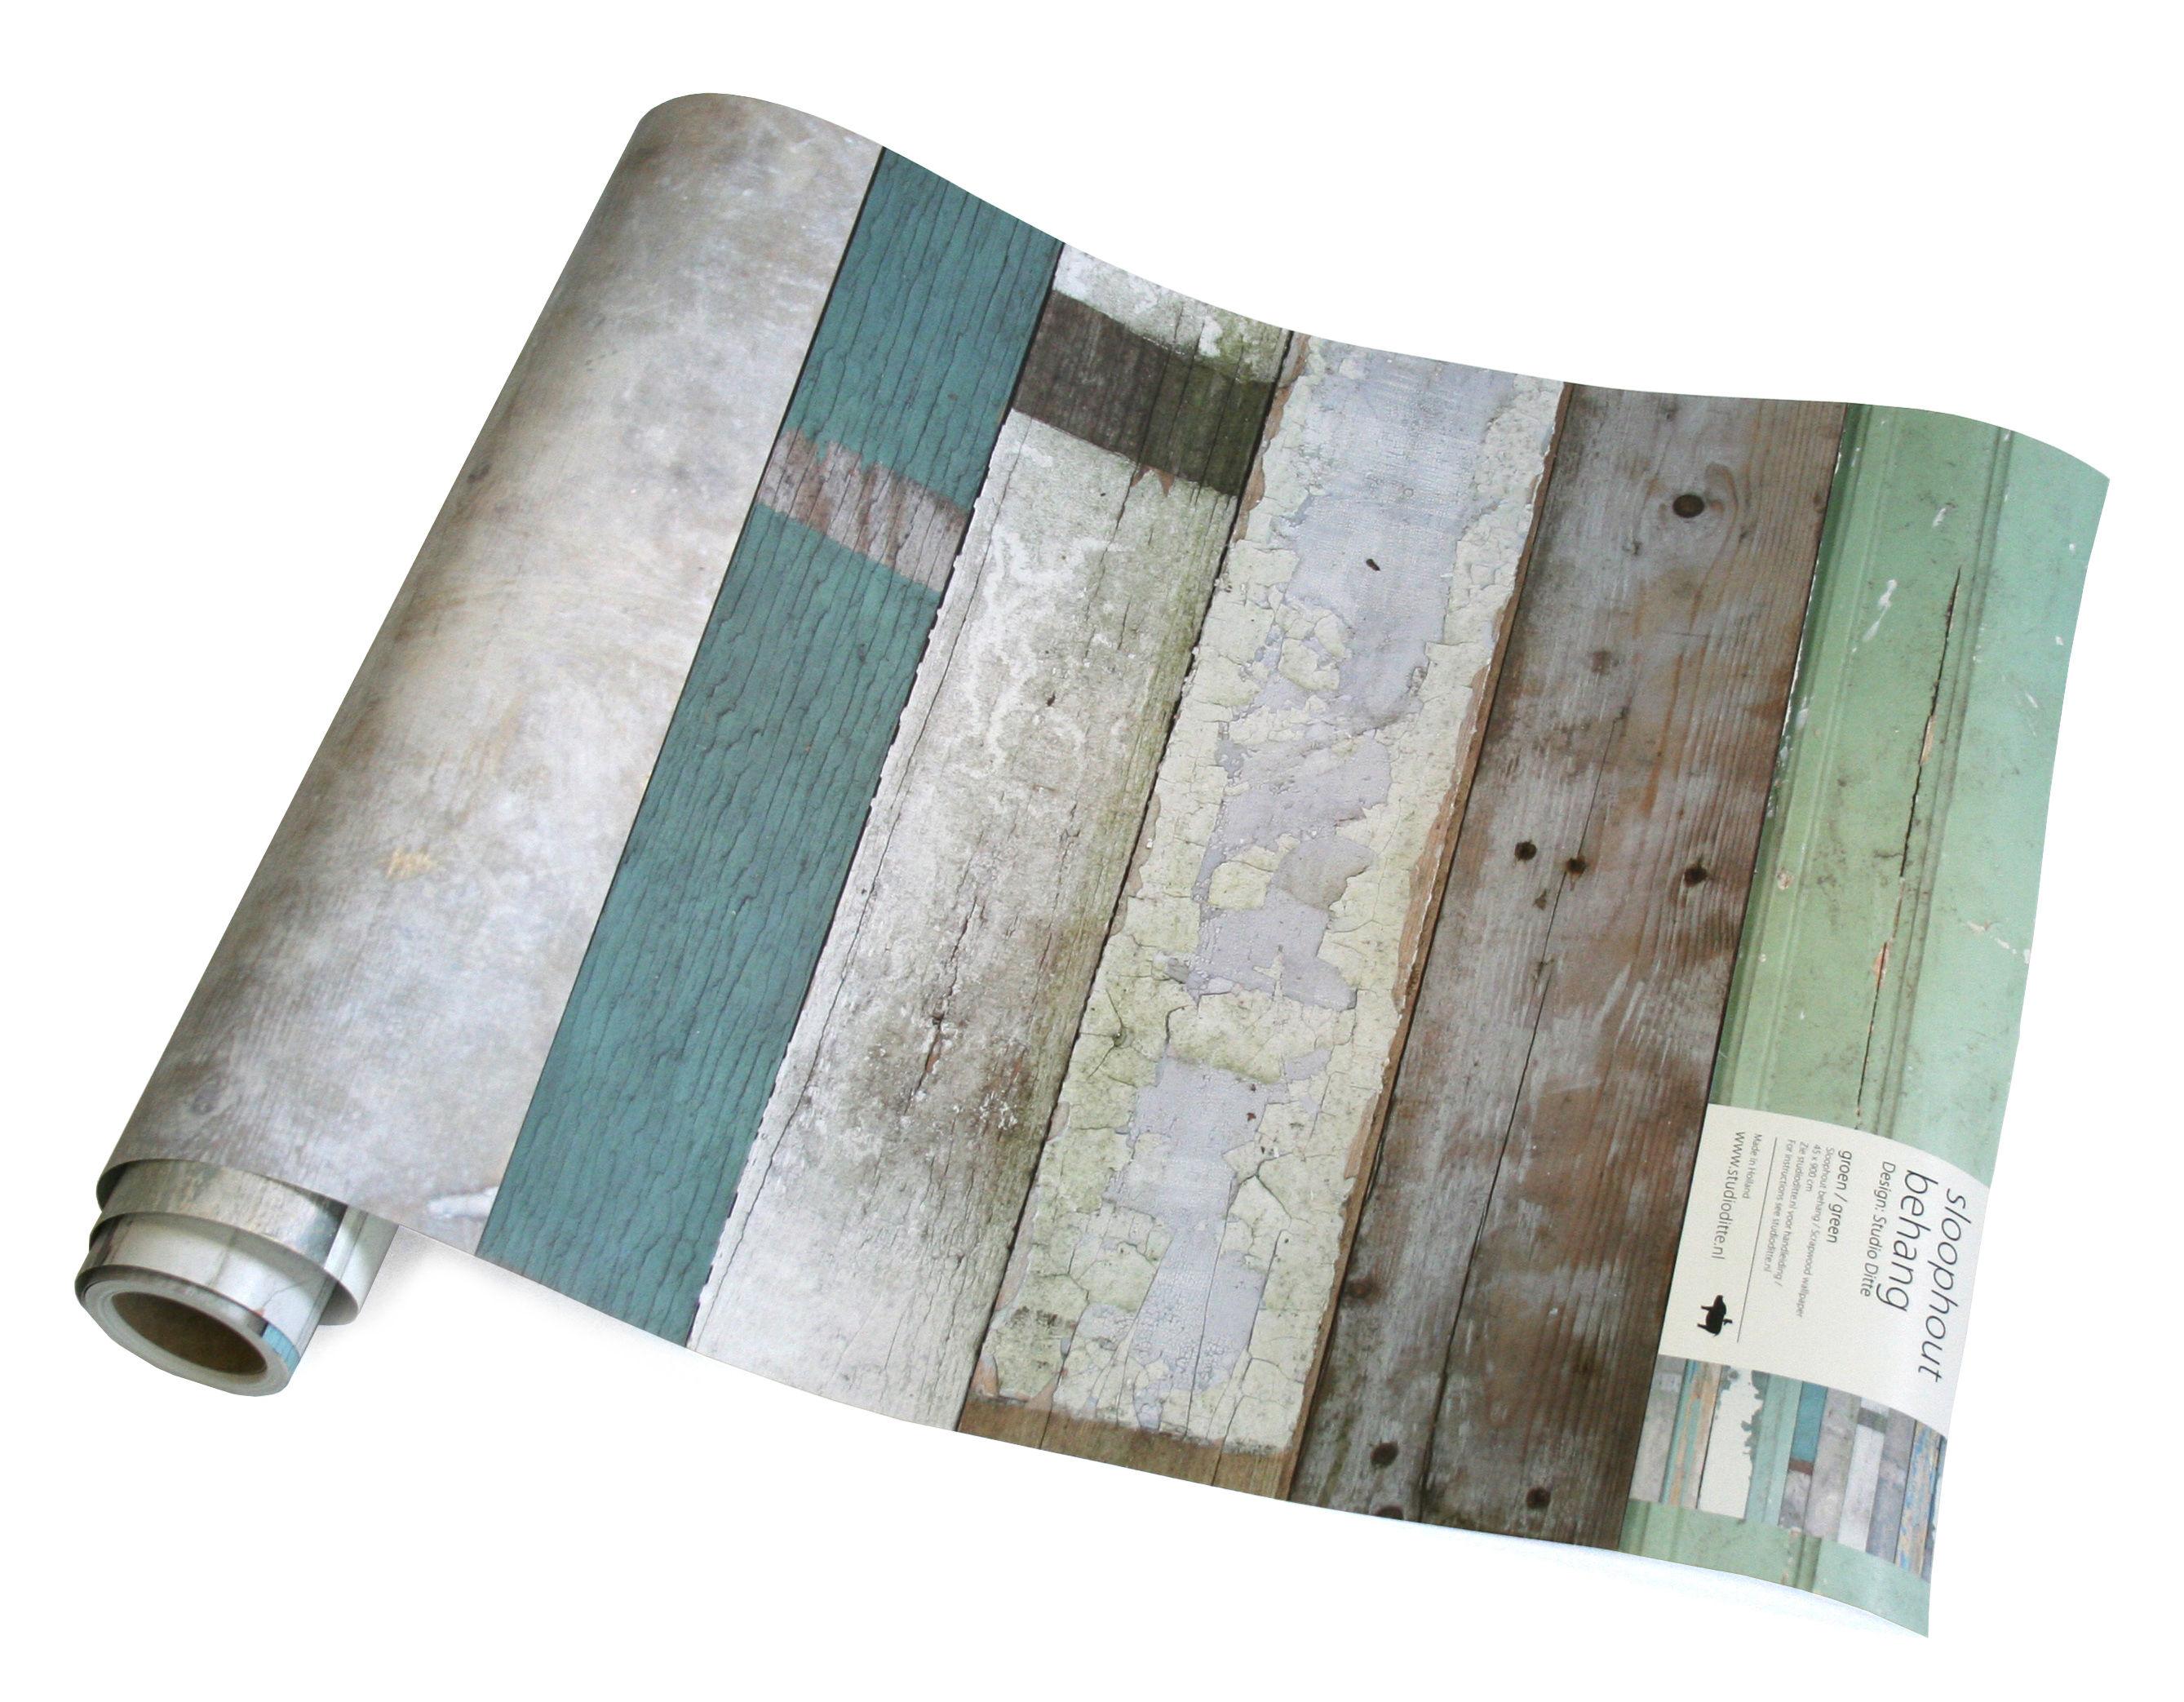 Decoration - Wallpaper & Wall Stickers - Scrapwood Wallpaper - 1 roll by studio ditte - Green - wallpaper